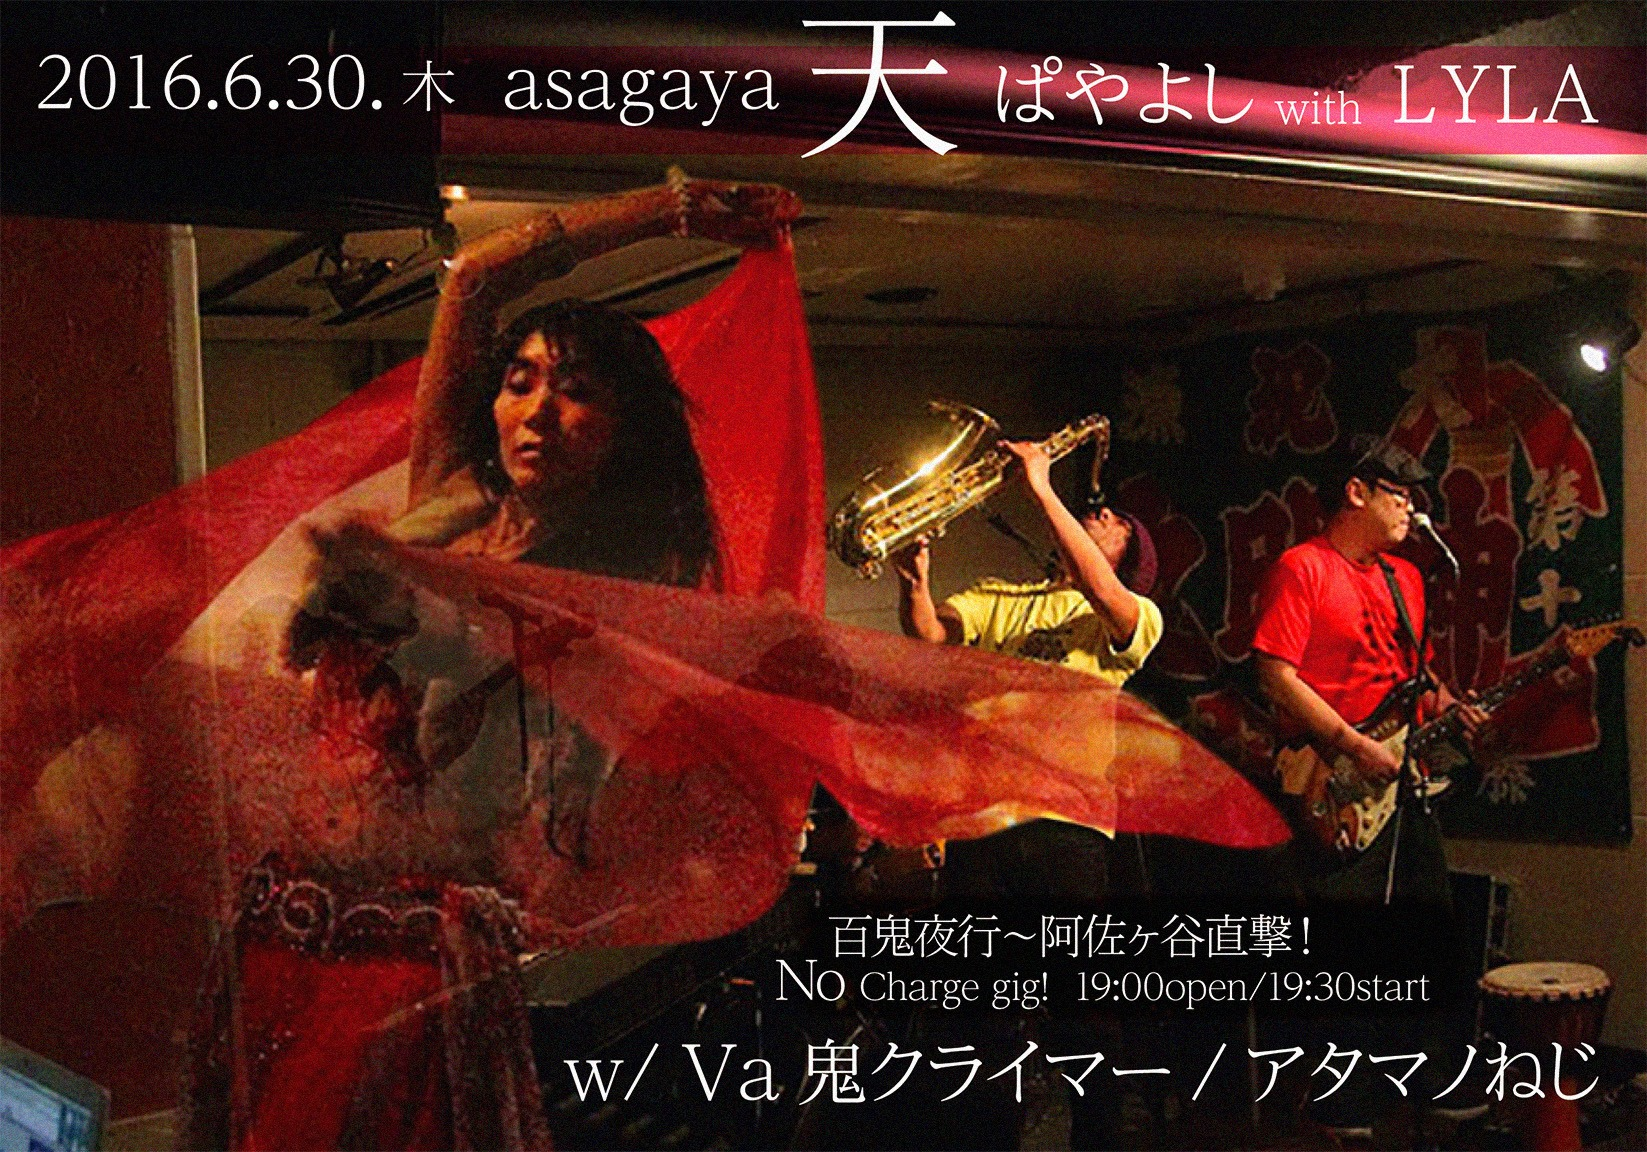 2016/6/30(木)阿佐ヶ谷 天「百鬼夜行~阿佐ヶ谷直撃!」